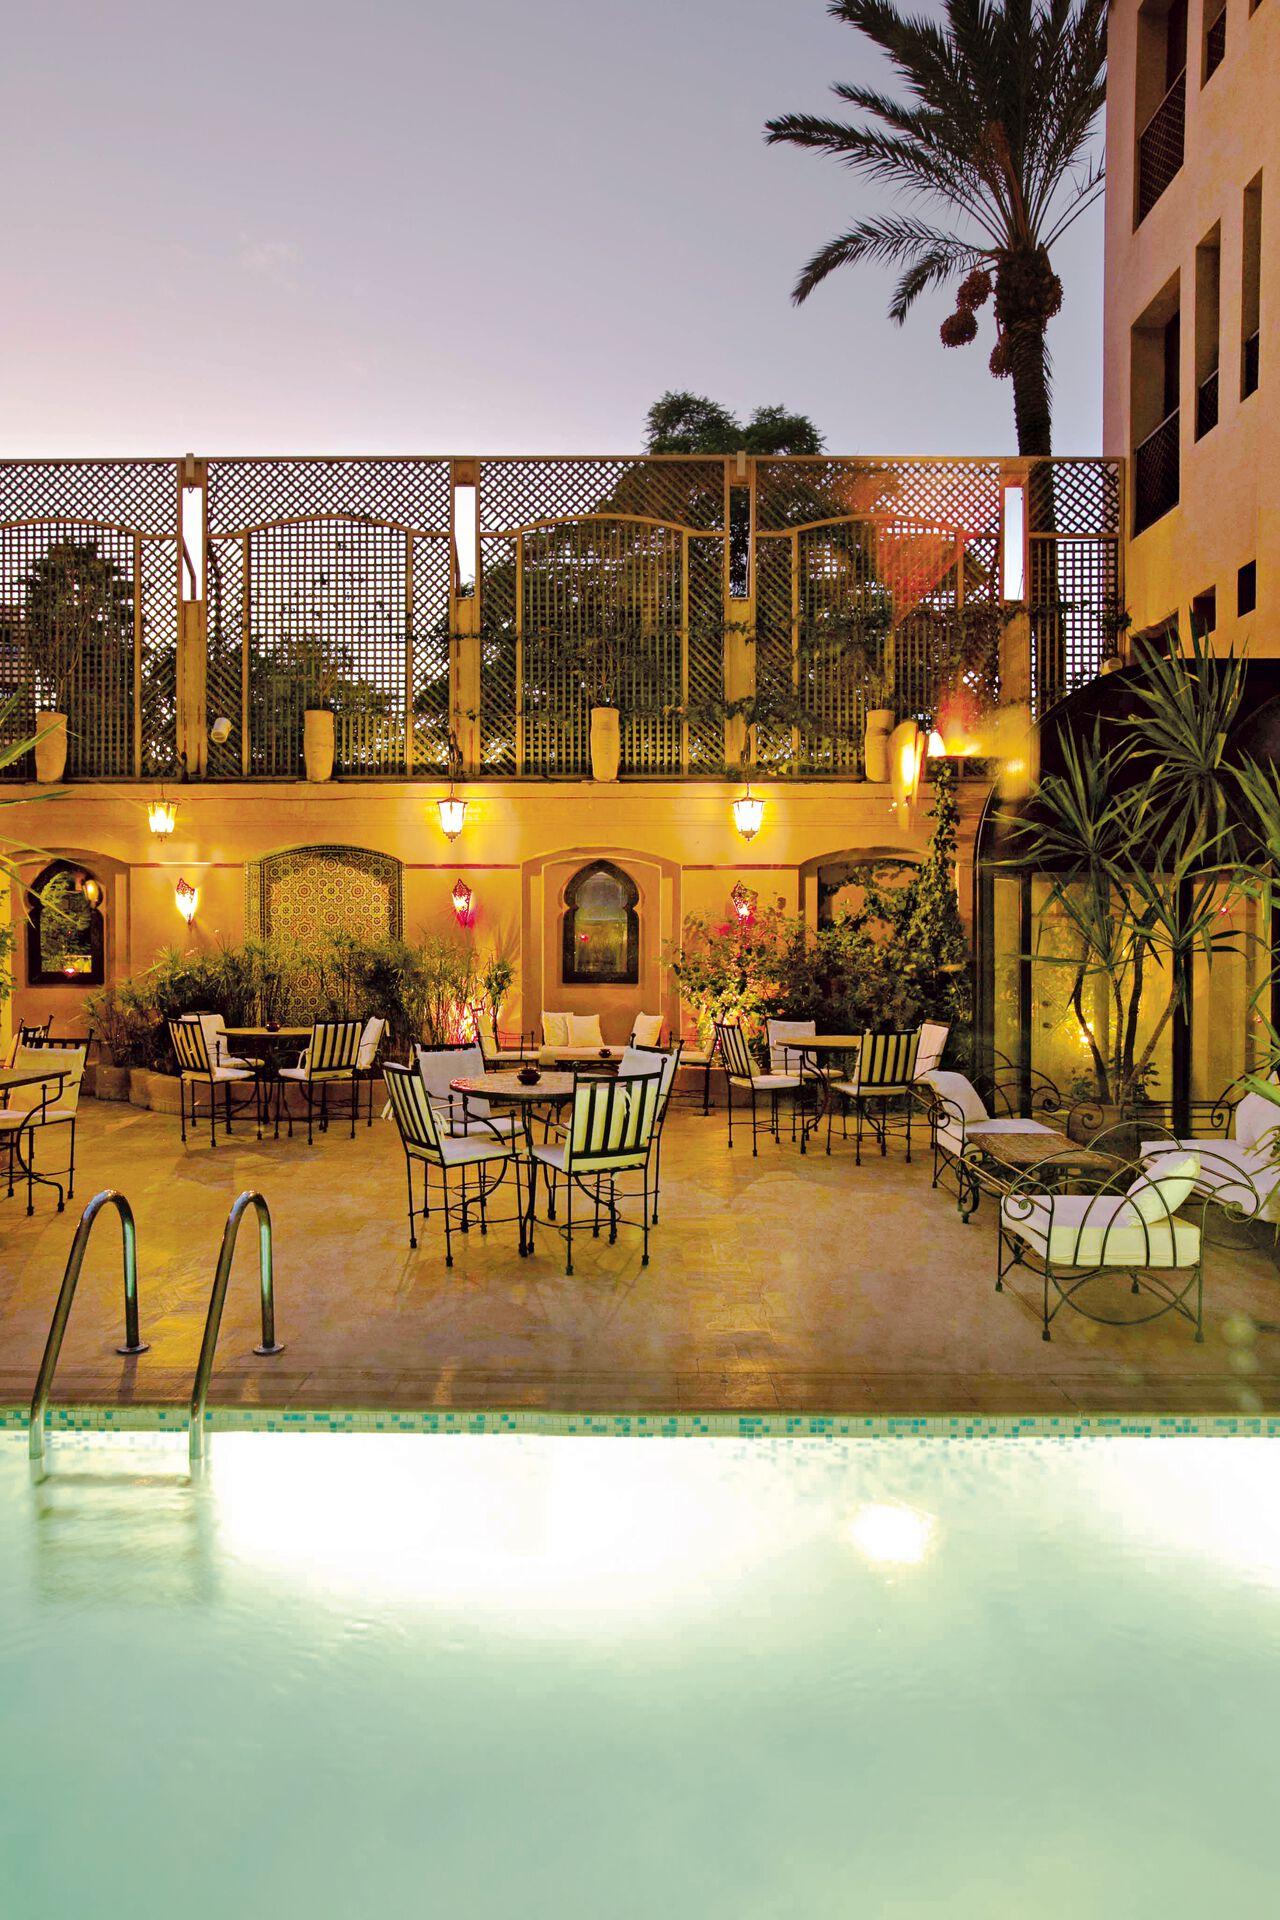 Séjour Marrakech - Hotel Nassim - 4*